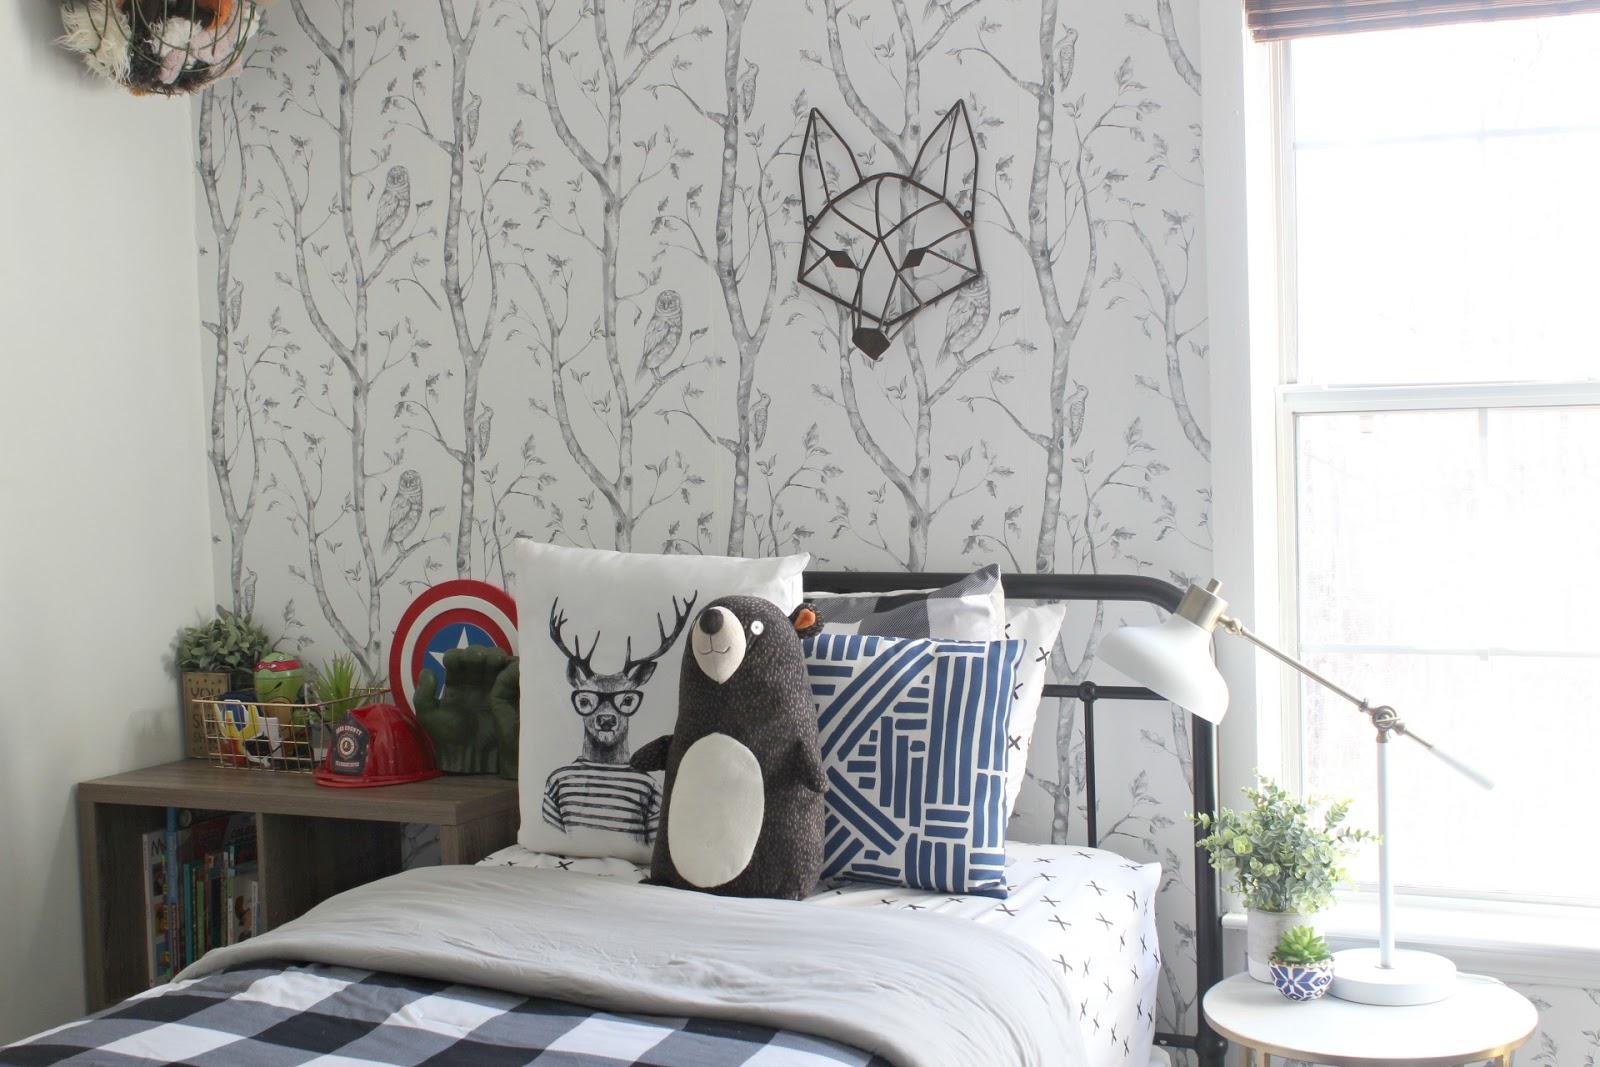 Big Boy Room Reveal: A Woodsy, Creative, Imaginative Space